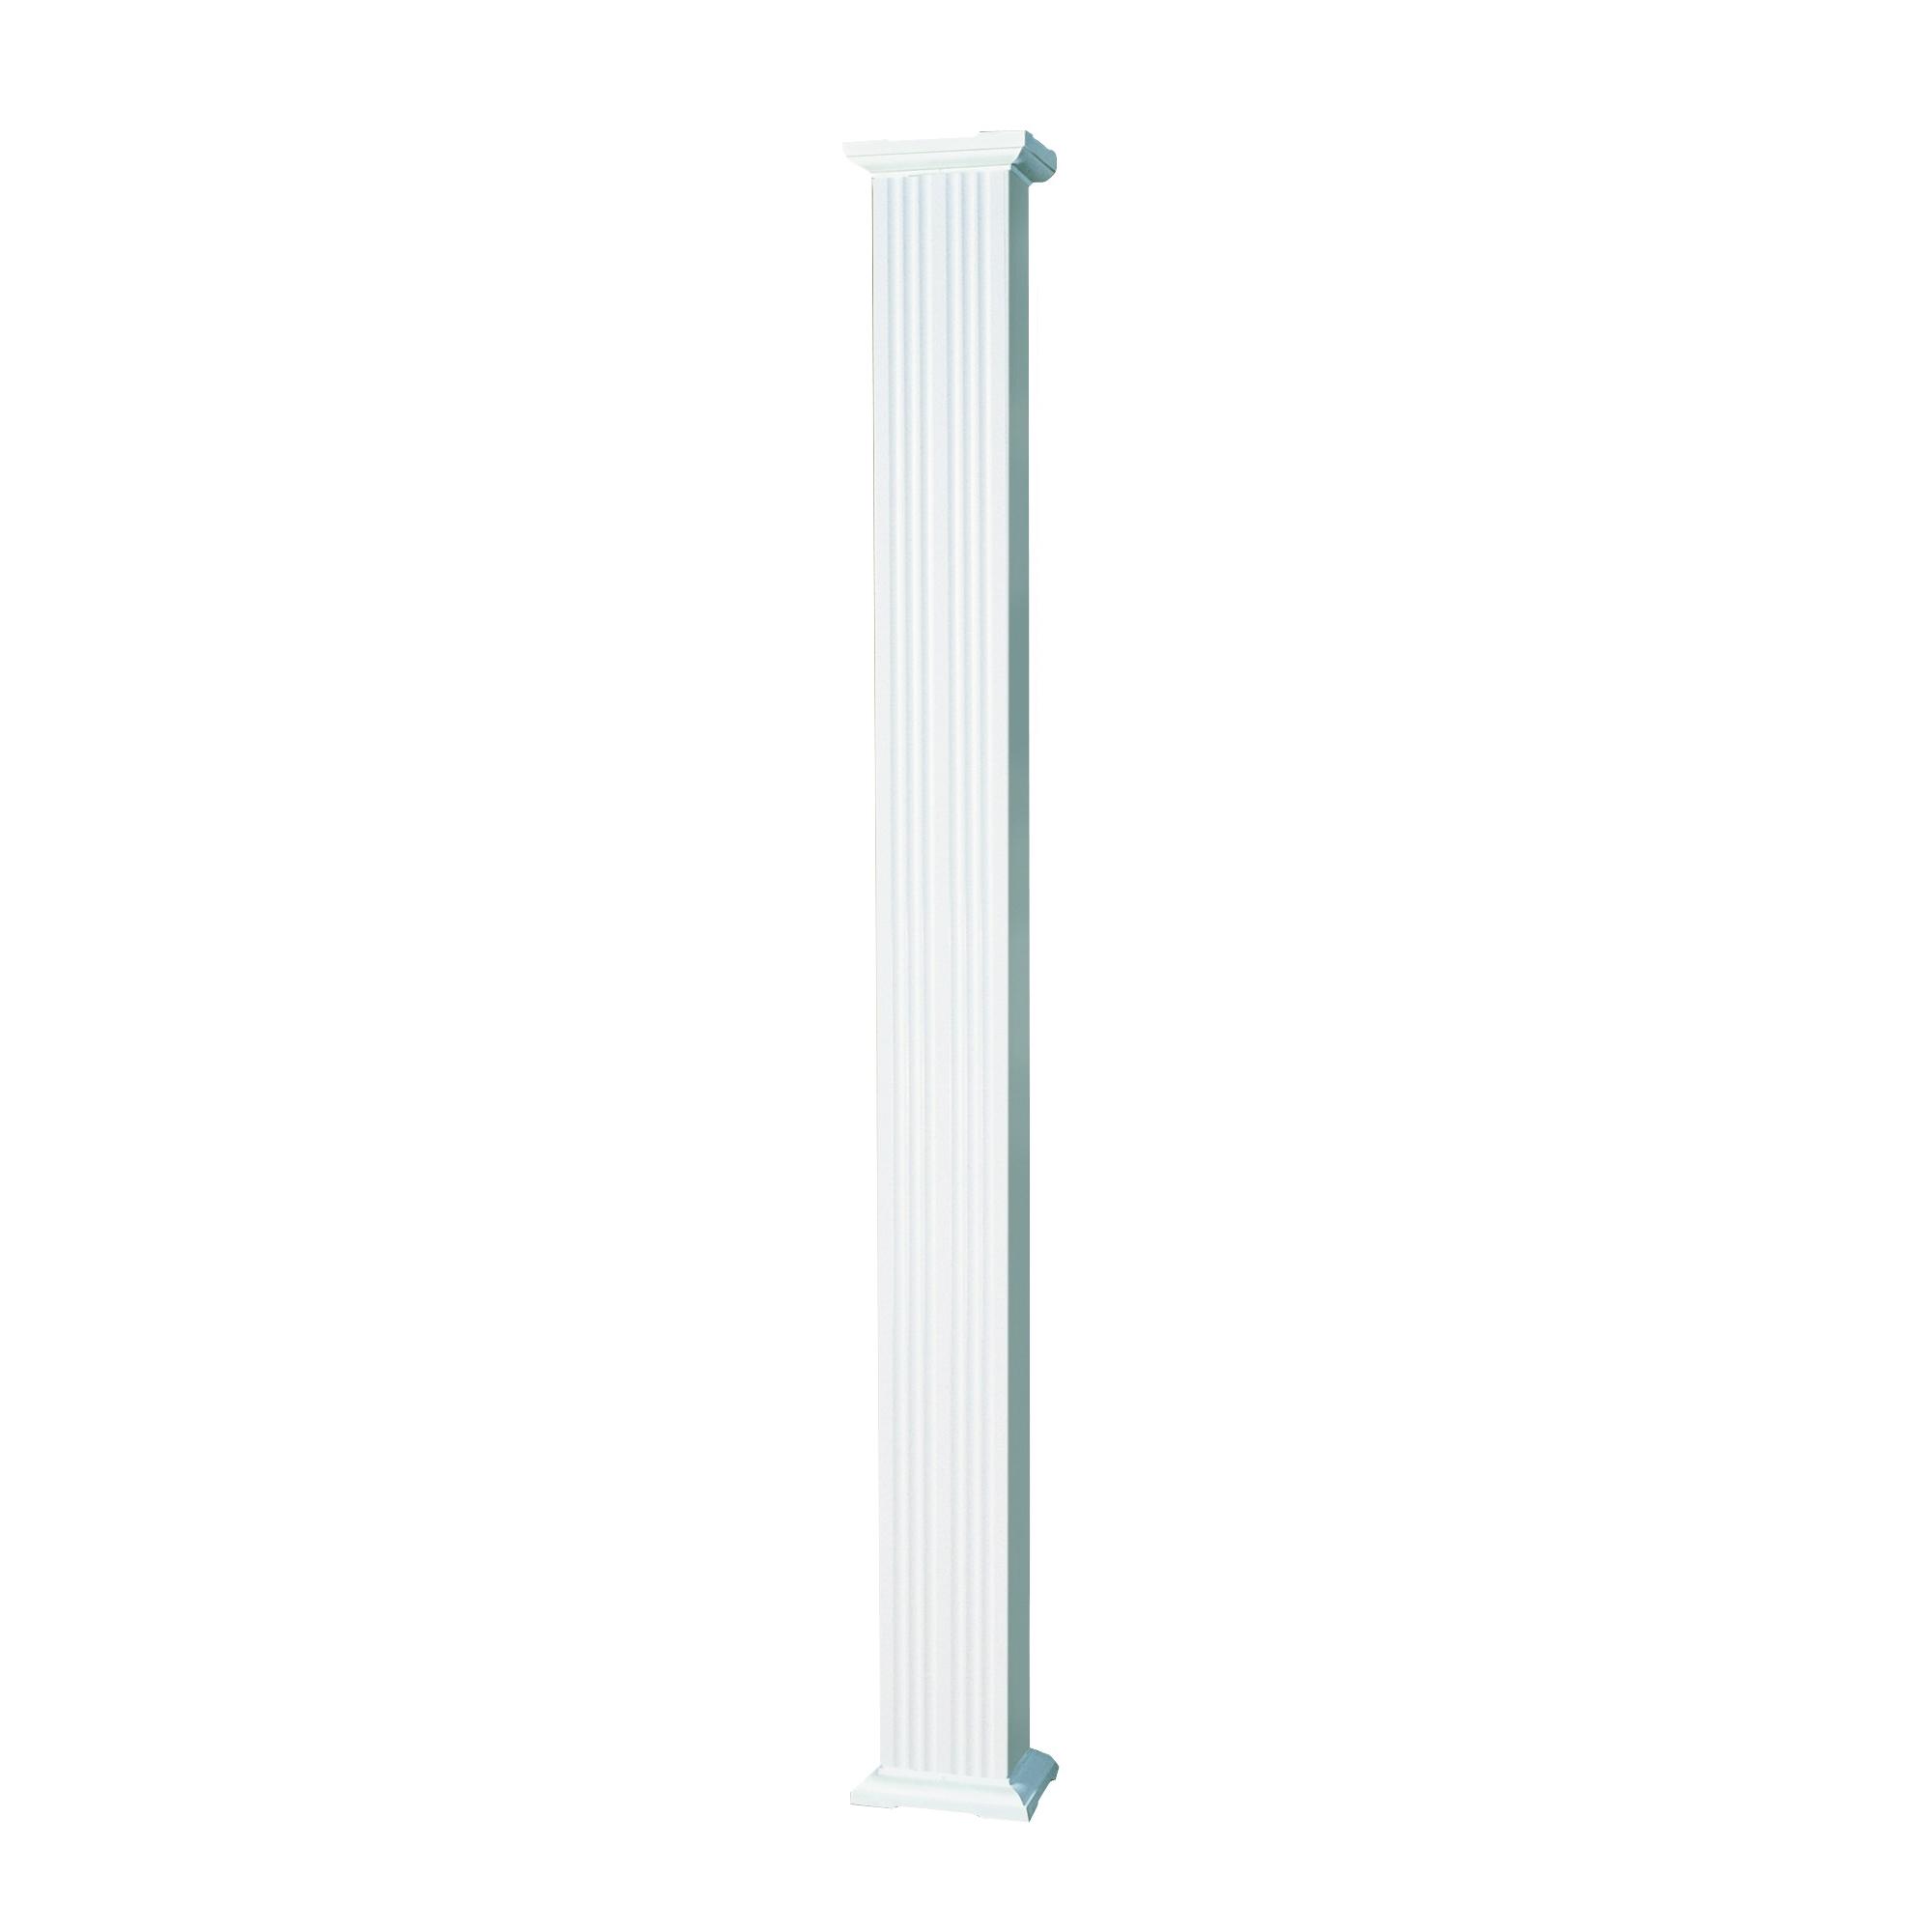 Picture of AFCO 80608 Square Column, 8 ft H, Square, Aluminum, White